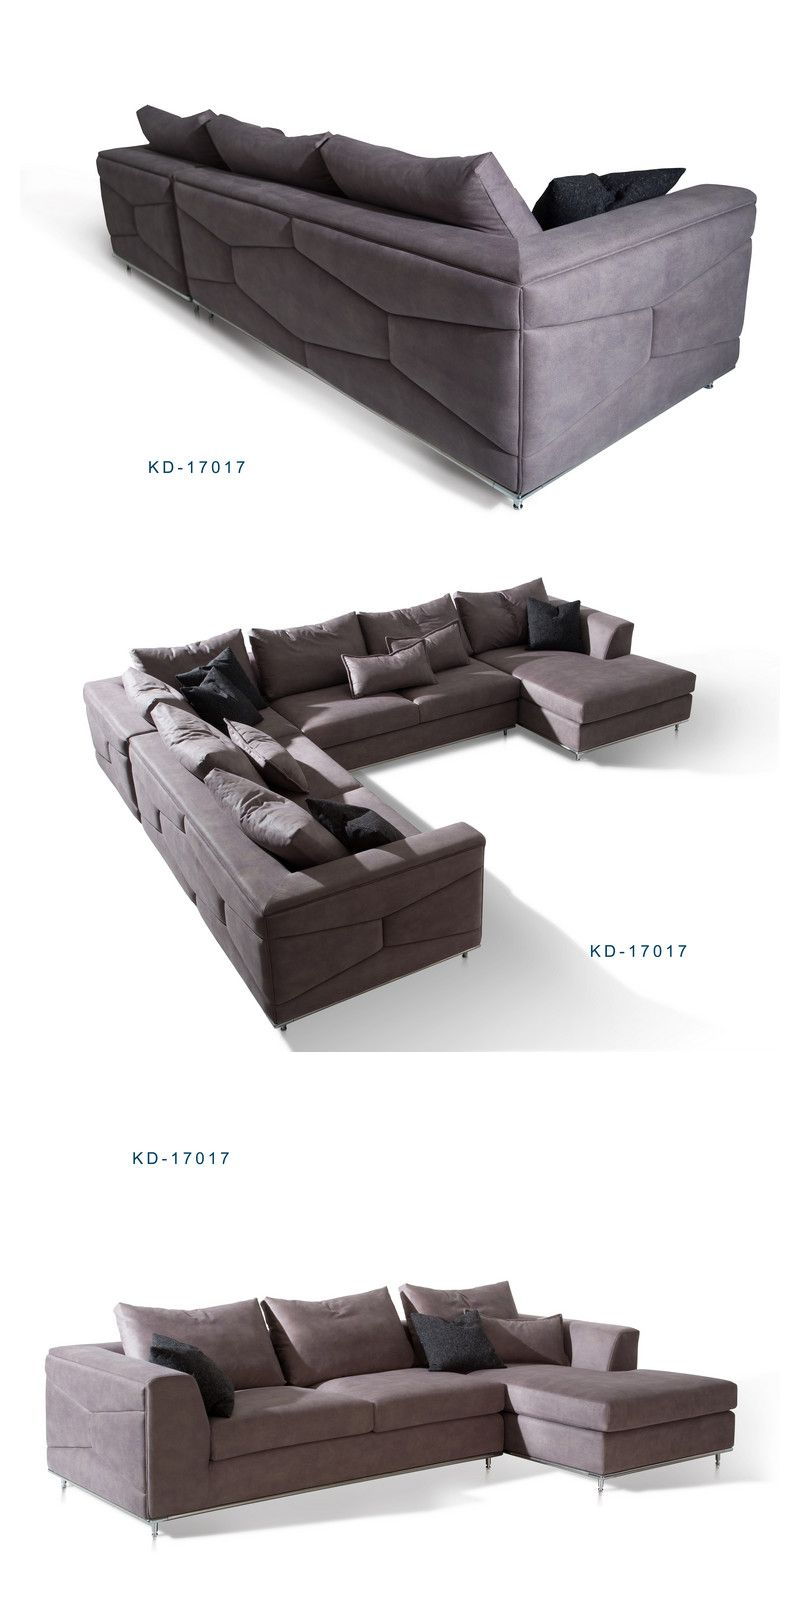 High Quality Luxury Contemporary Modern Sectional Sofa With Pattern Micro Fiber Cocheenfurniture Tuftedsofa Softsofa Contemporarysofa Modernsofa